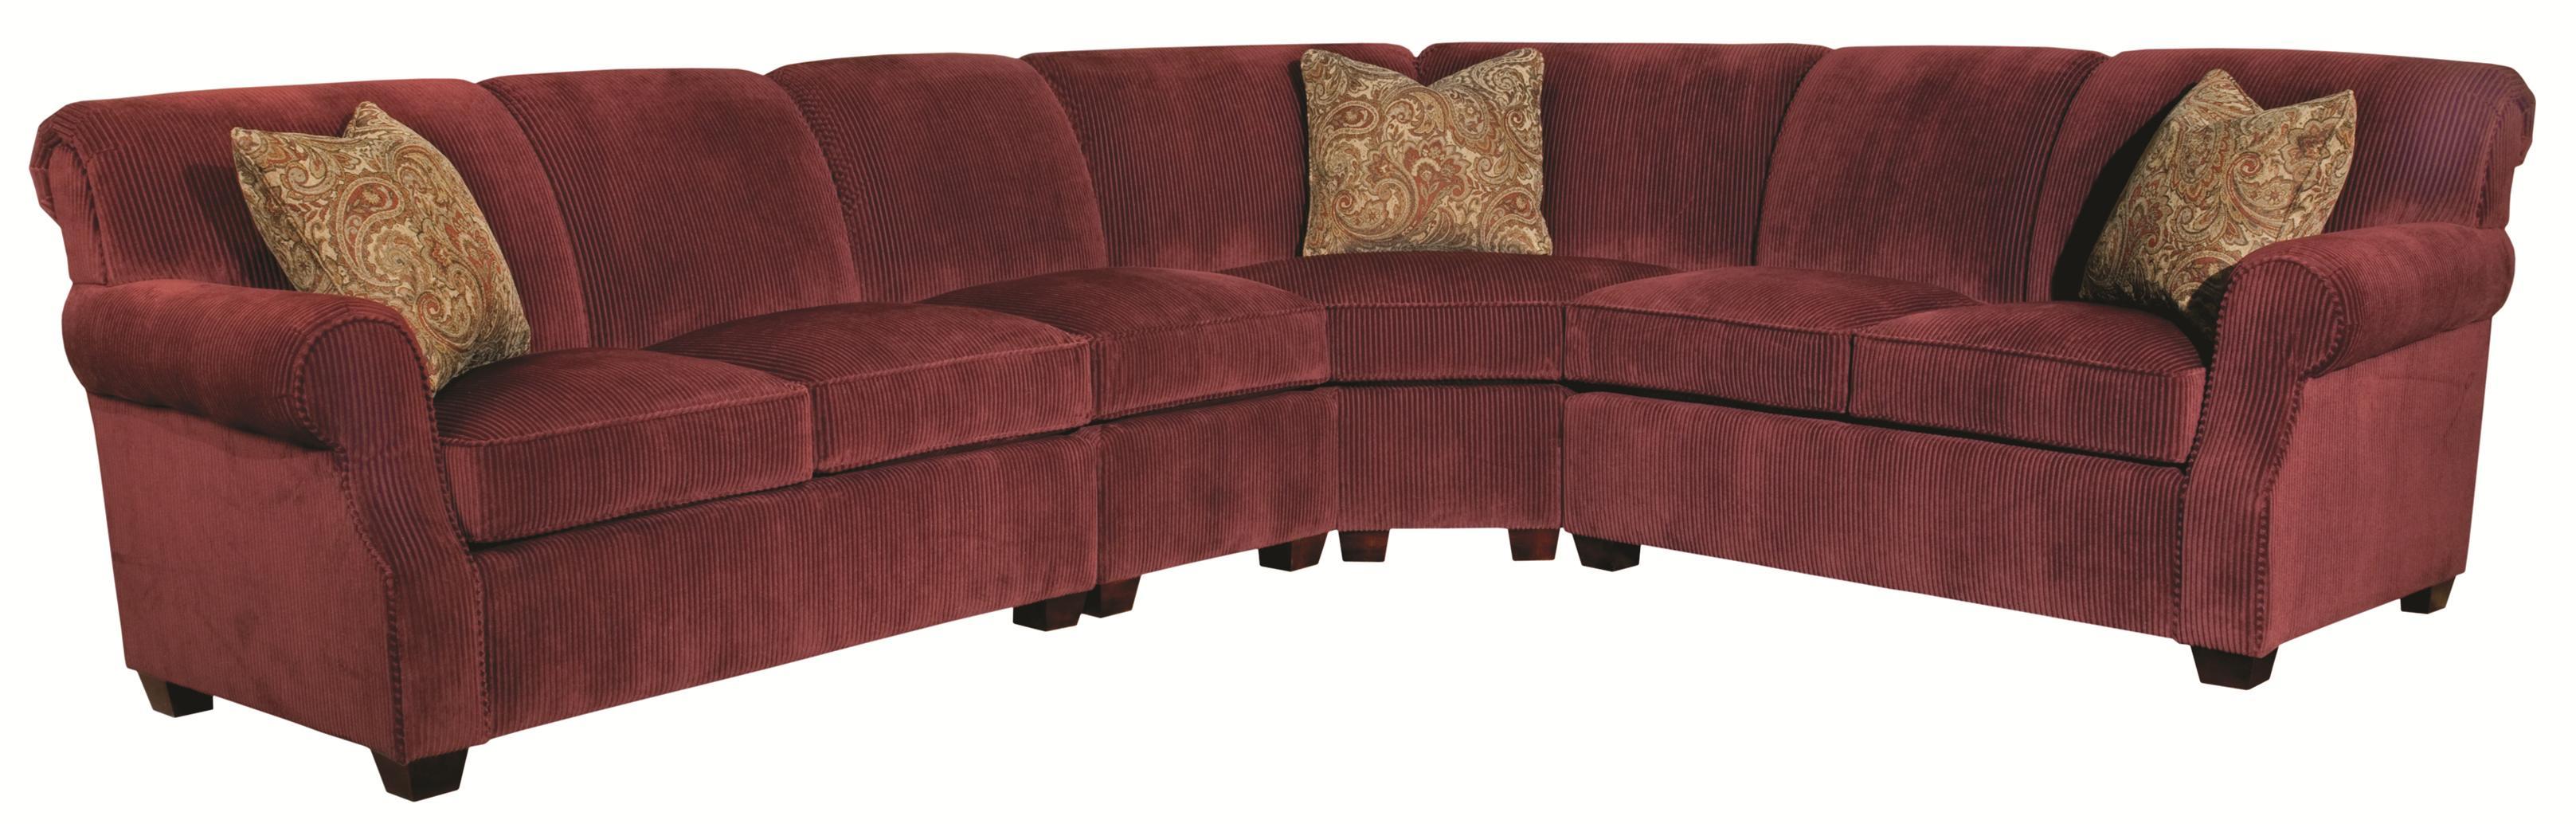 Lynchburg 4 Piece Sectional Sofa by Kincaid Furniture at Johnny Janosik